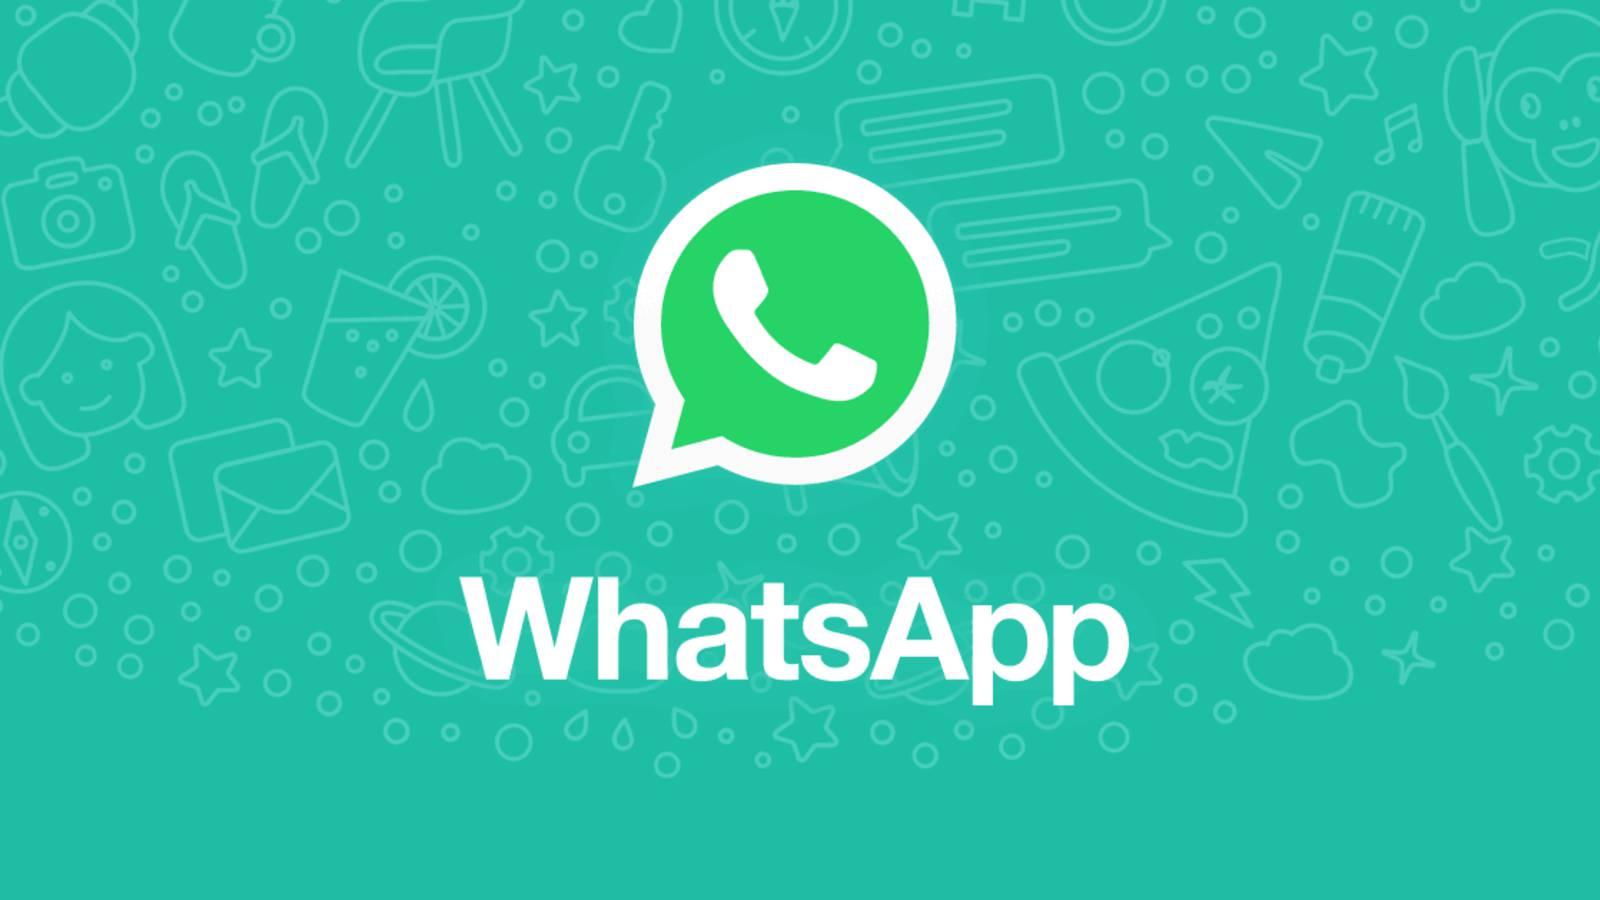 WhatsApp public